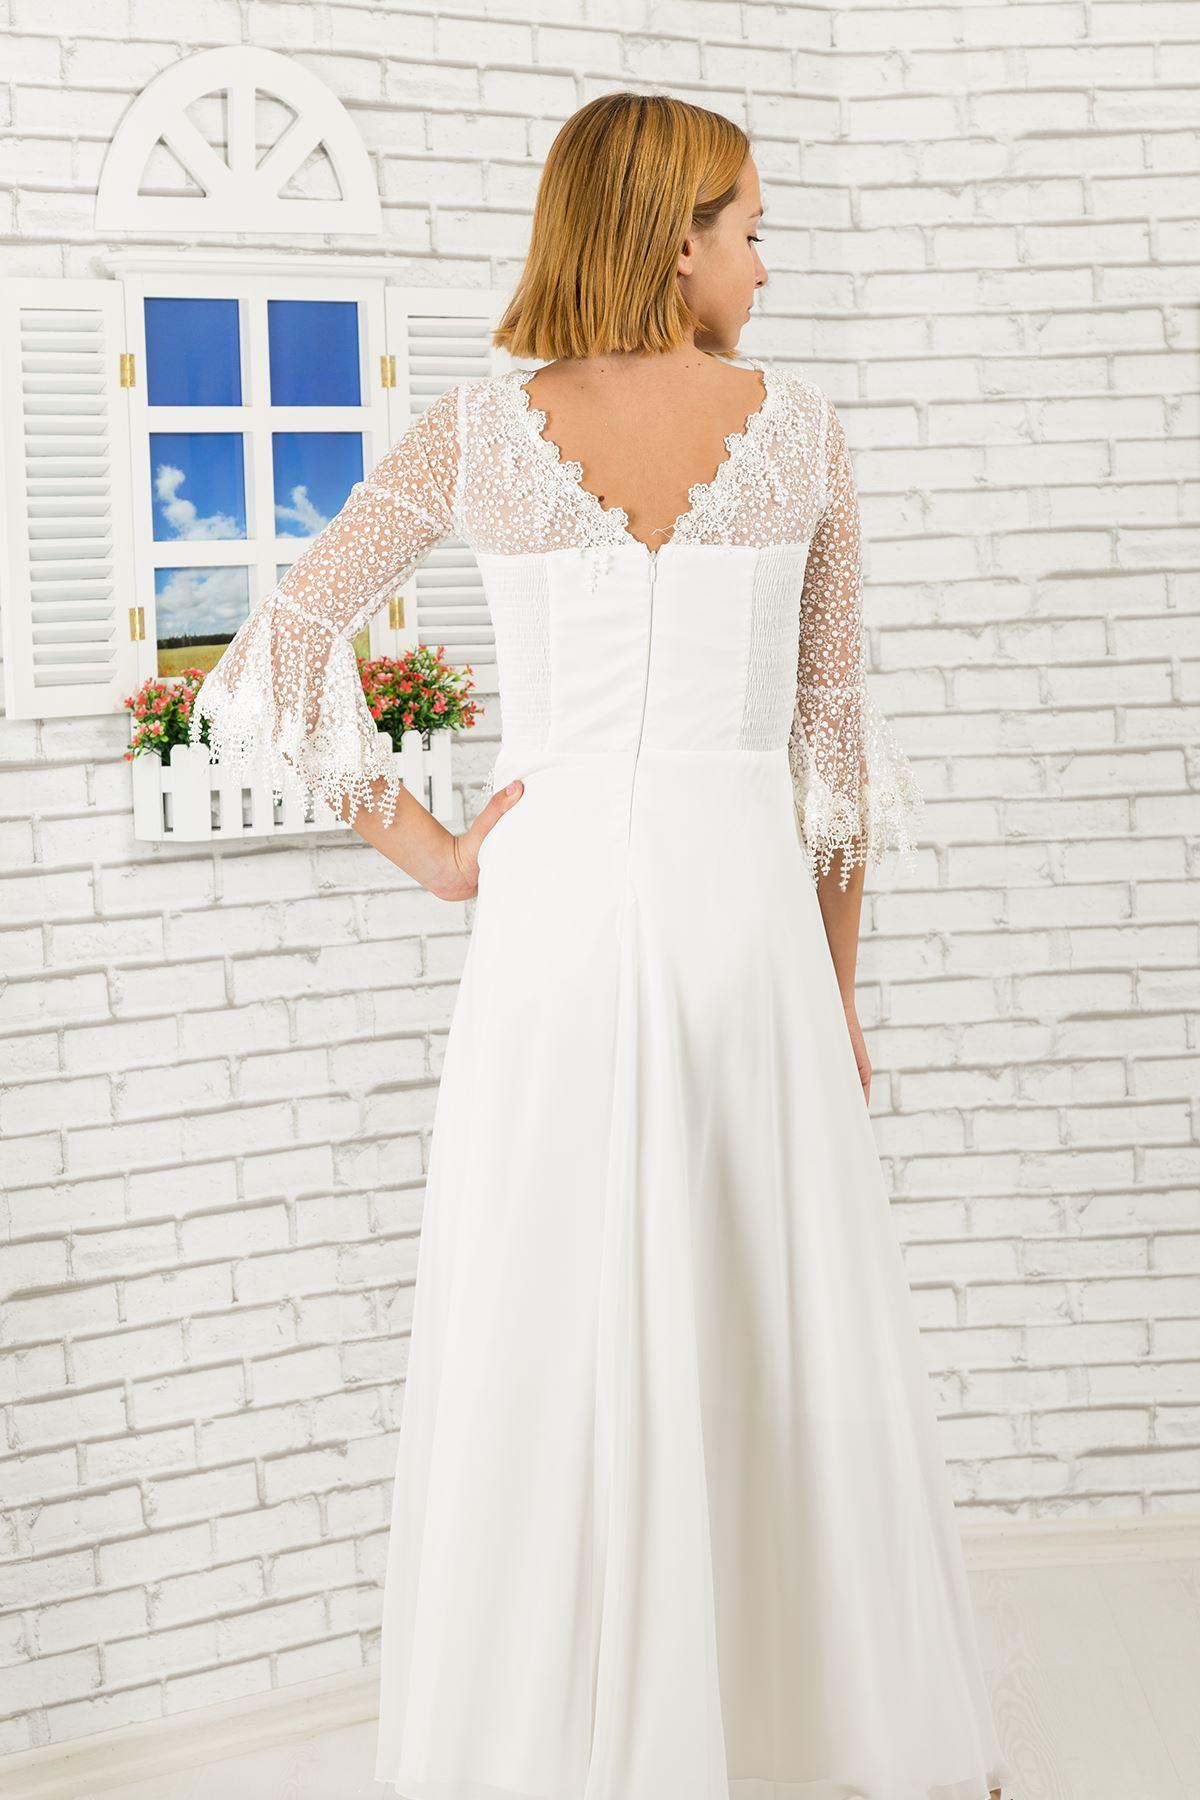 Lace Sleeve Detail, Chiffon Girl Evening Dress 464 Ivory